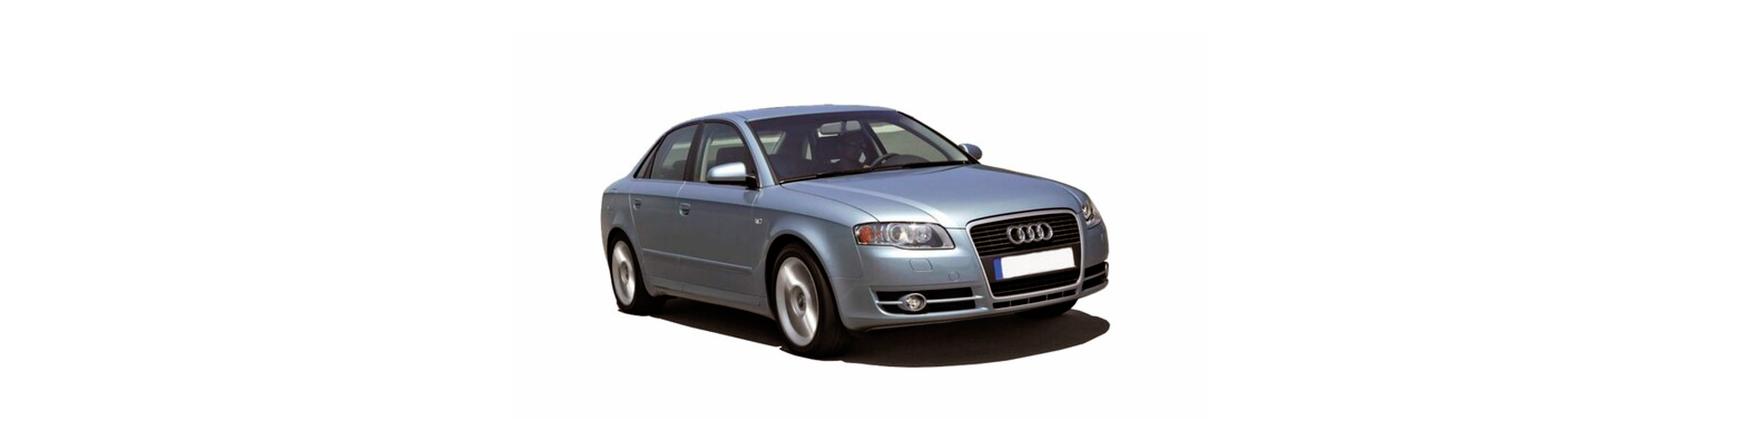 Audi A4 de 2004,  2005,  2006,  2007, 2008